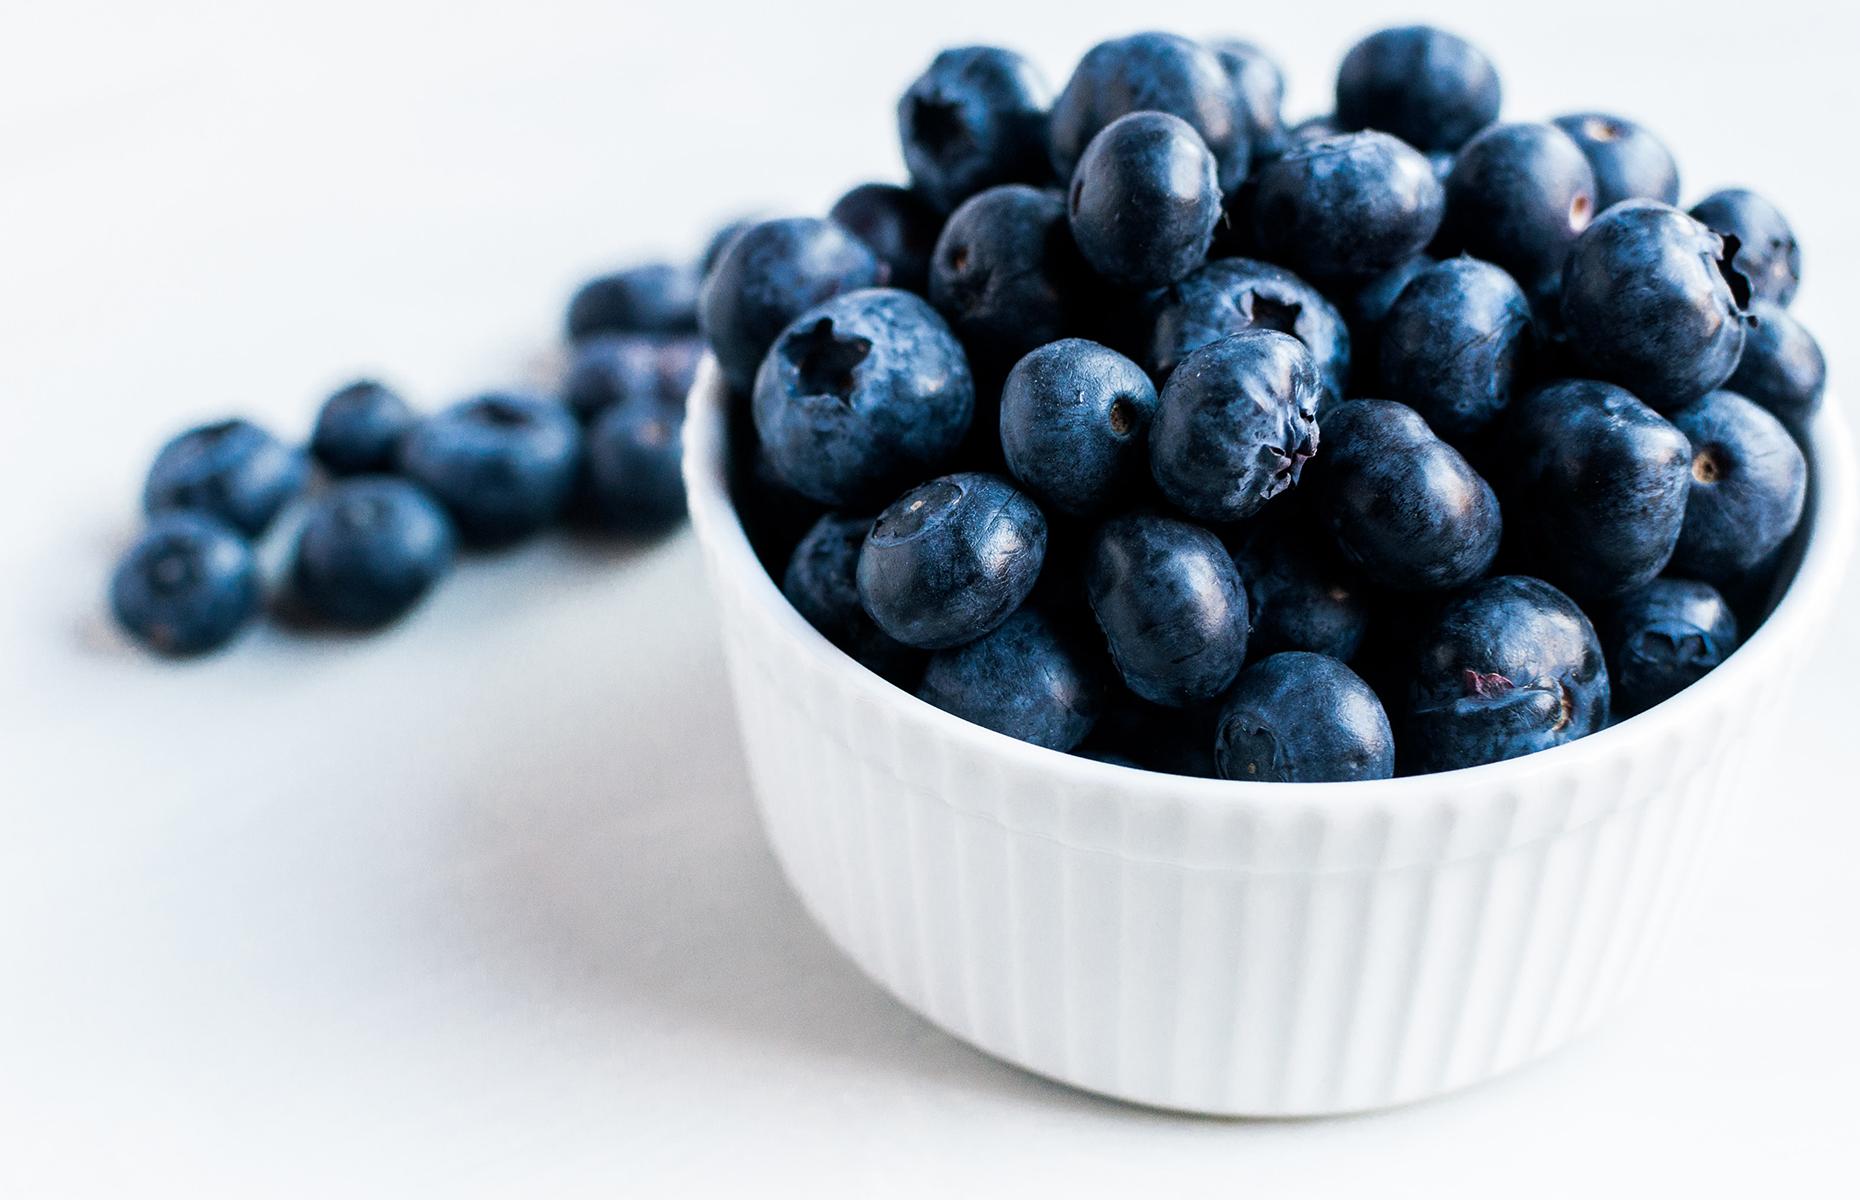 A pot of blueberries (Image: Vanesa conunaese/Unsplash)